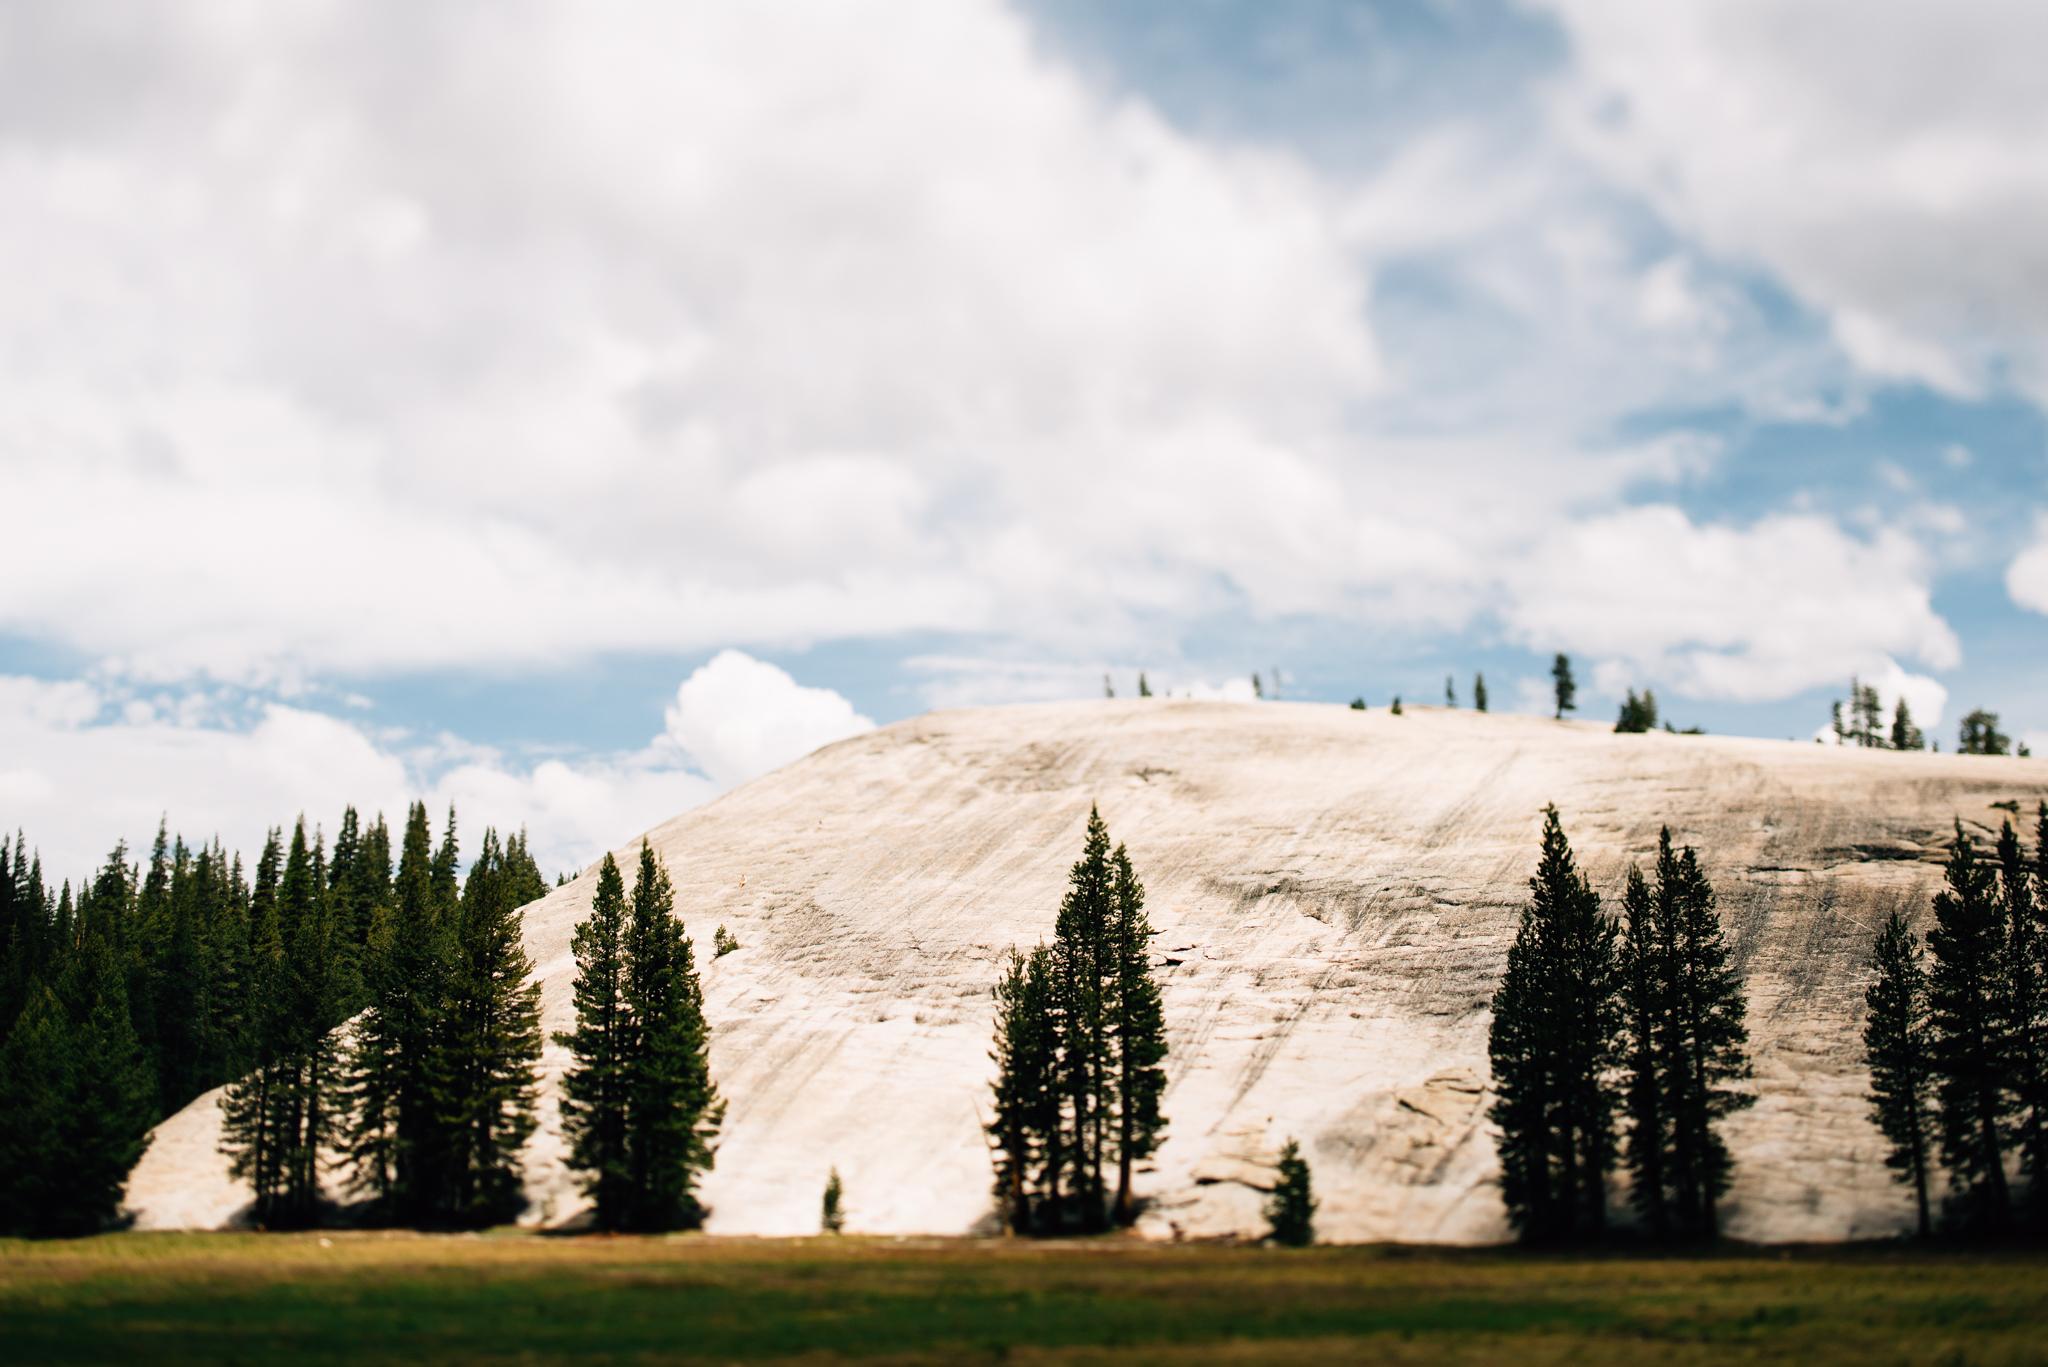 ©The Ryans Photography - Los Angeles Travel - Tuolomne Meadows Yosemite-026.jpg